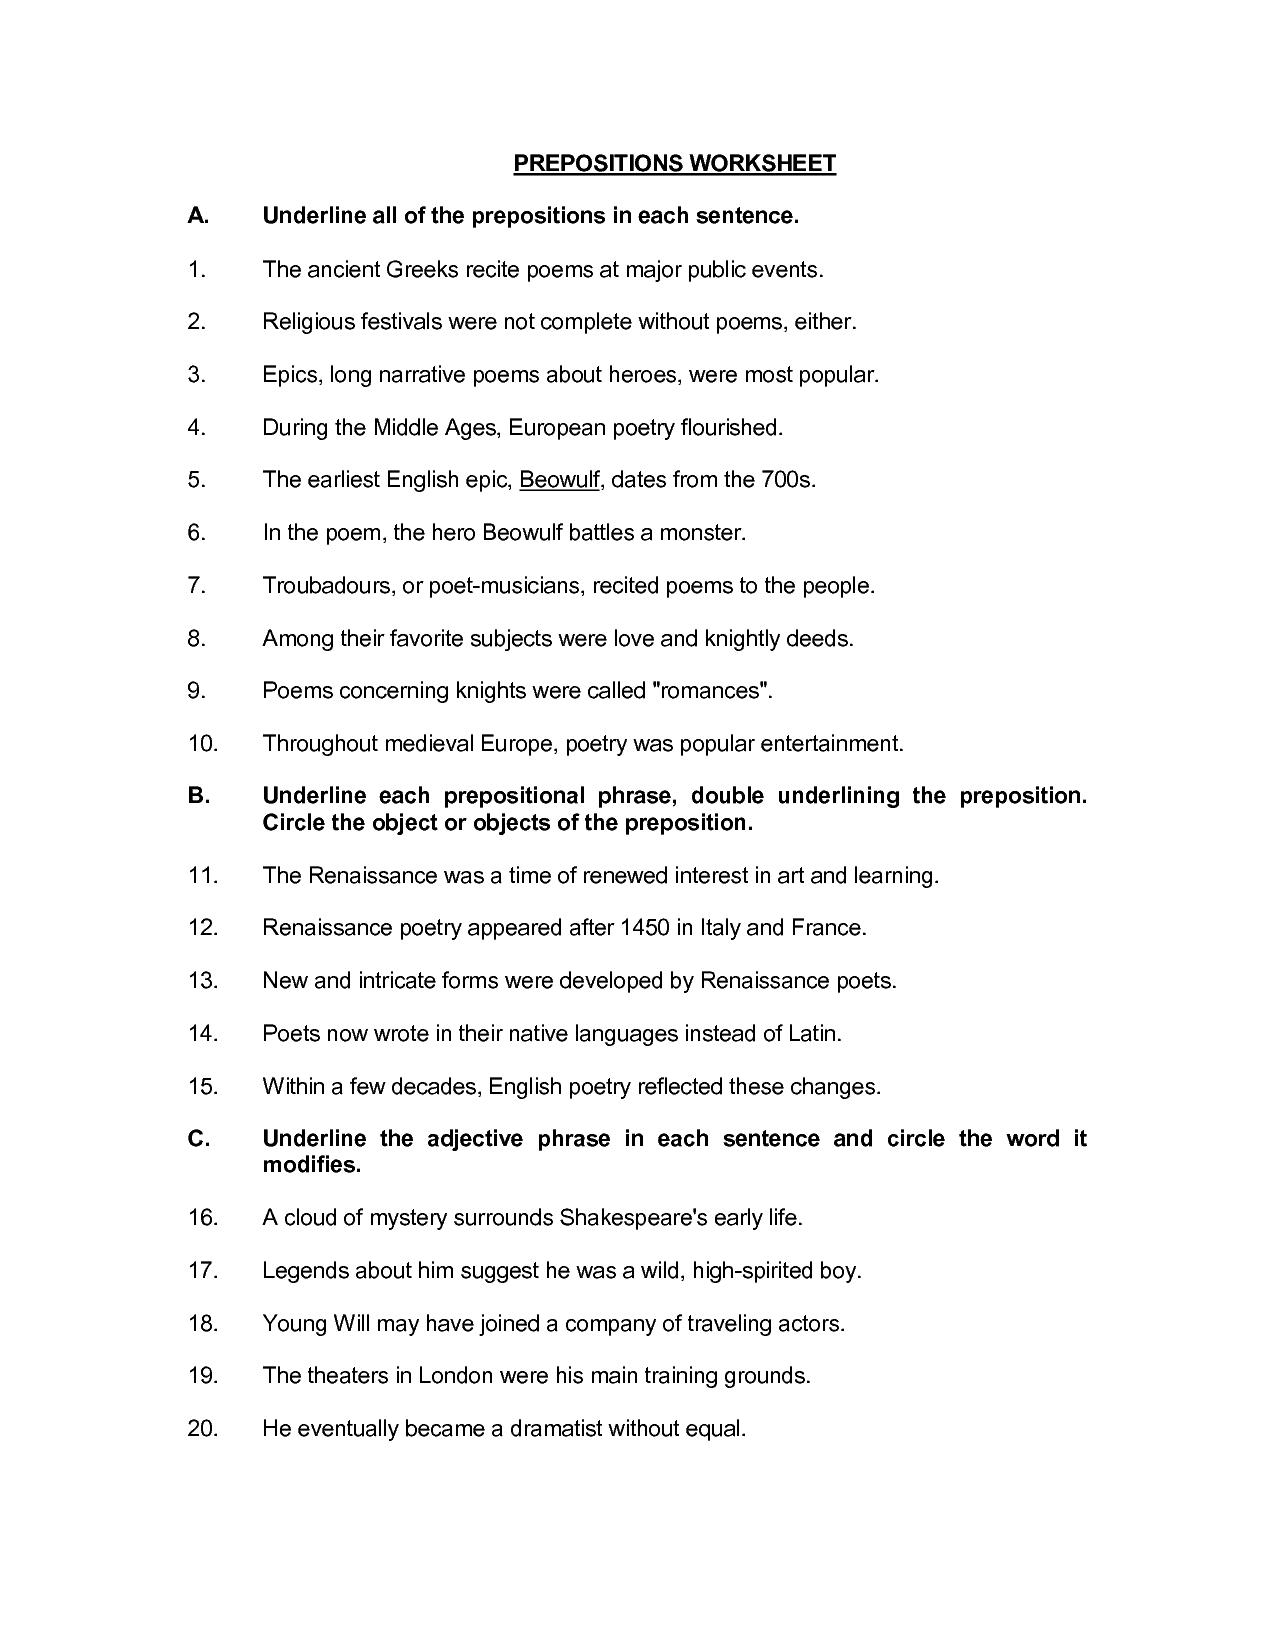 Printable Preposition Worksheets 6th Grade